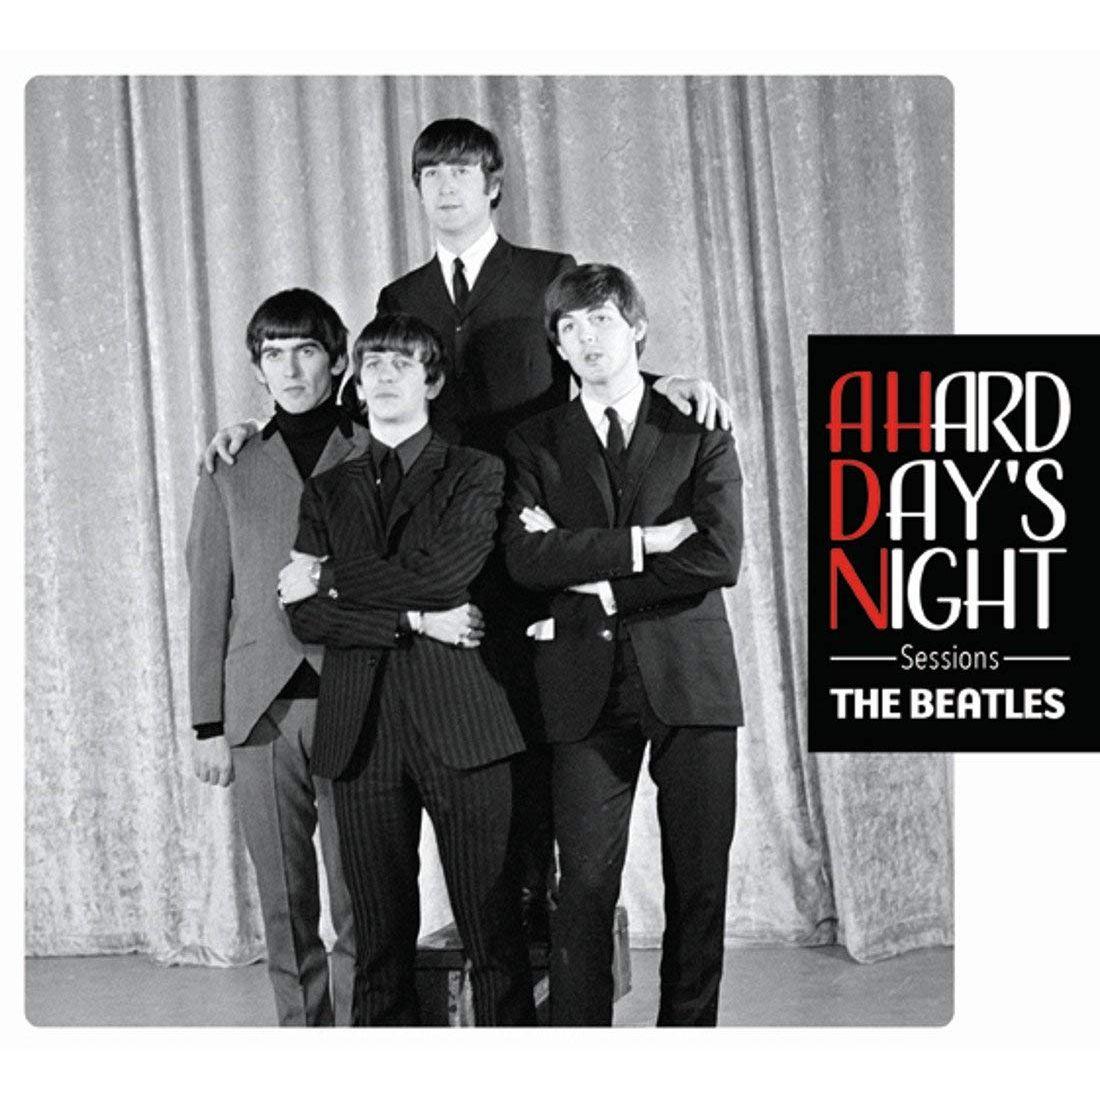 BEATLES / ビートルズ / A HARD DAY'S NIGHT SESSIONS / ア・ハード・デイズ・ナイト・セッションズ